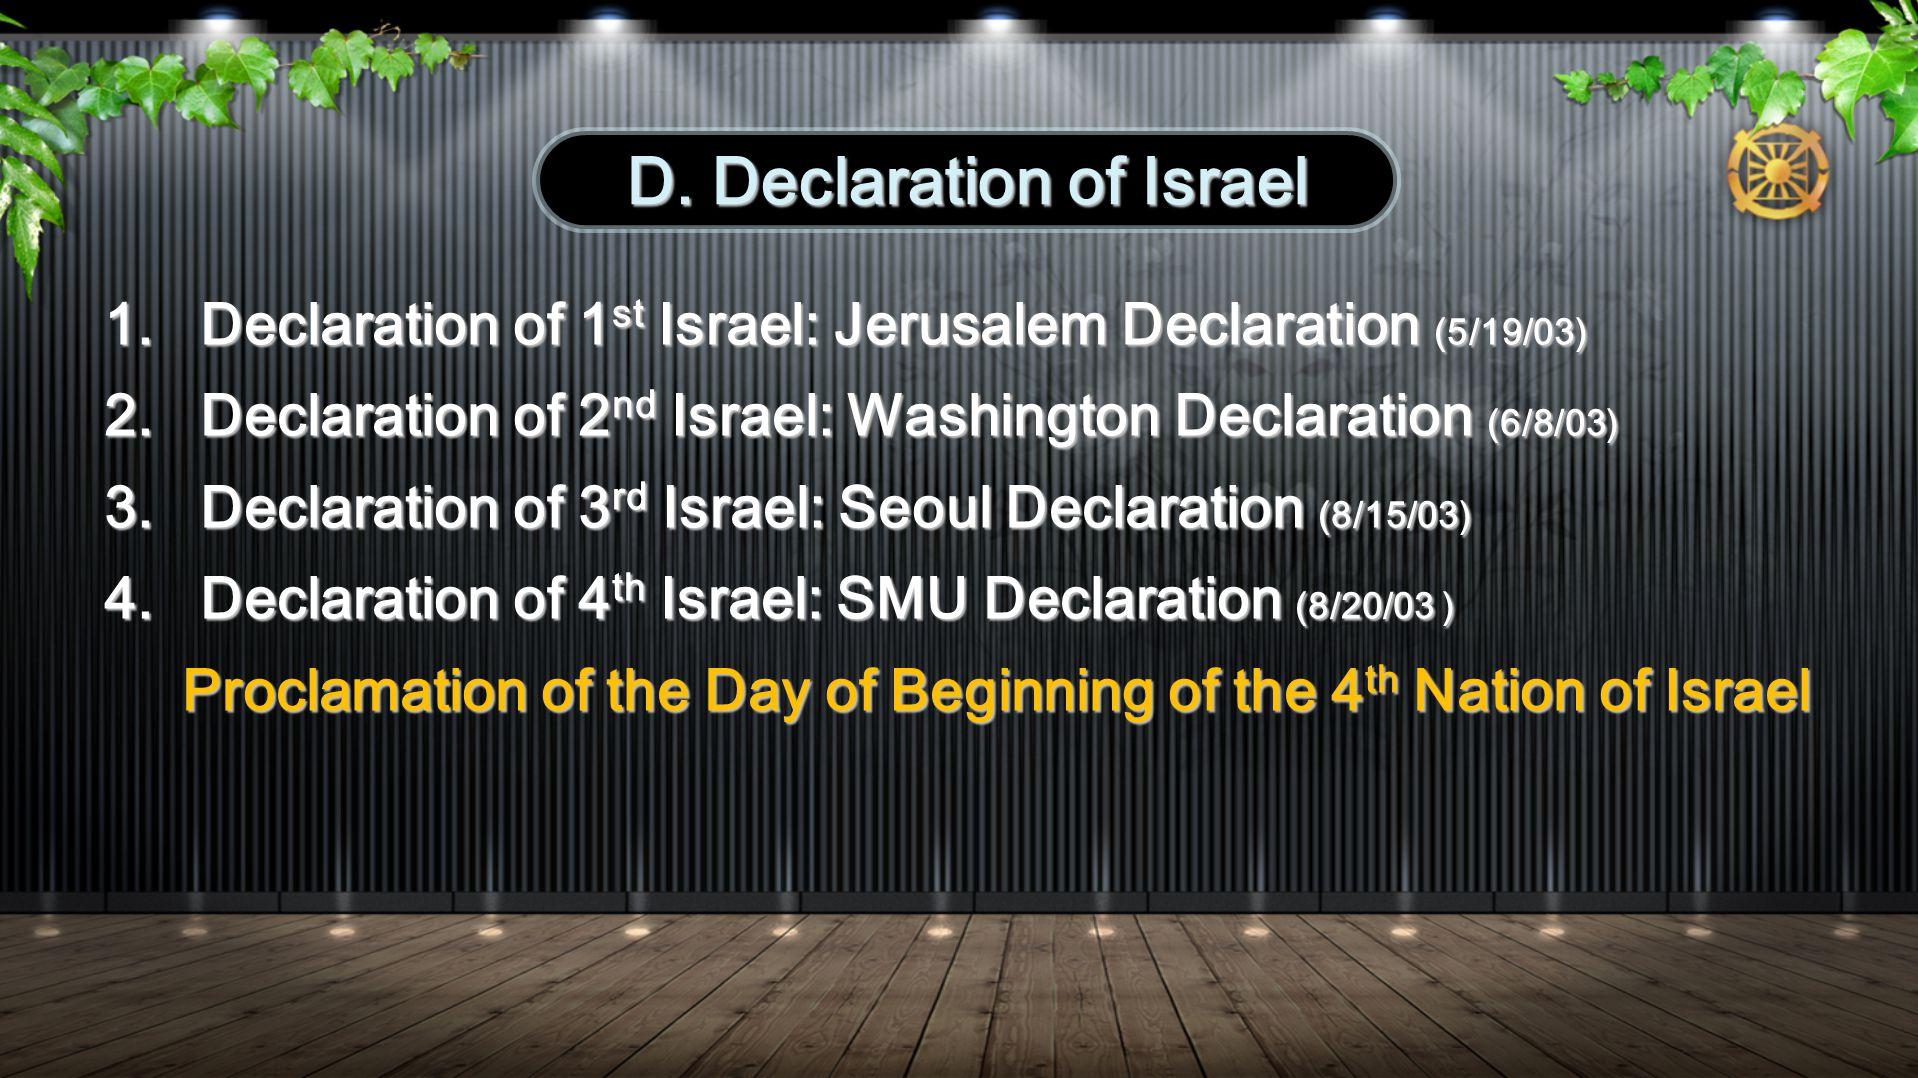 1. Declaration of 1 st Israel: Jerusalem Declaration (5/19/03) 2.